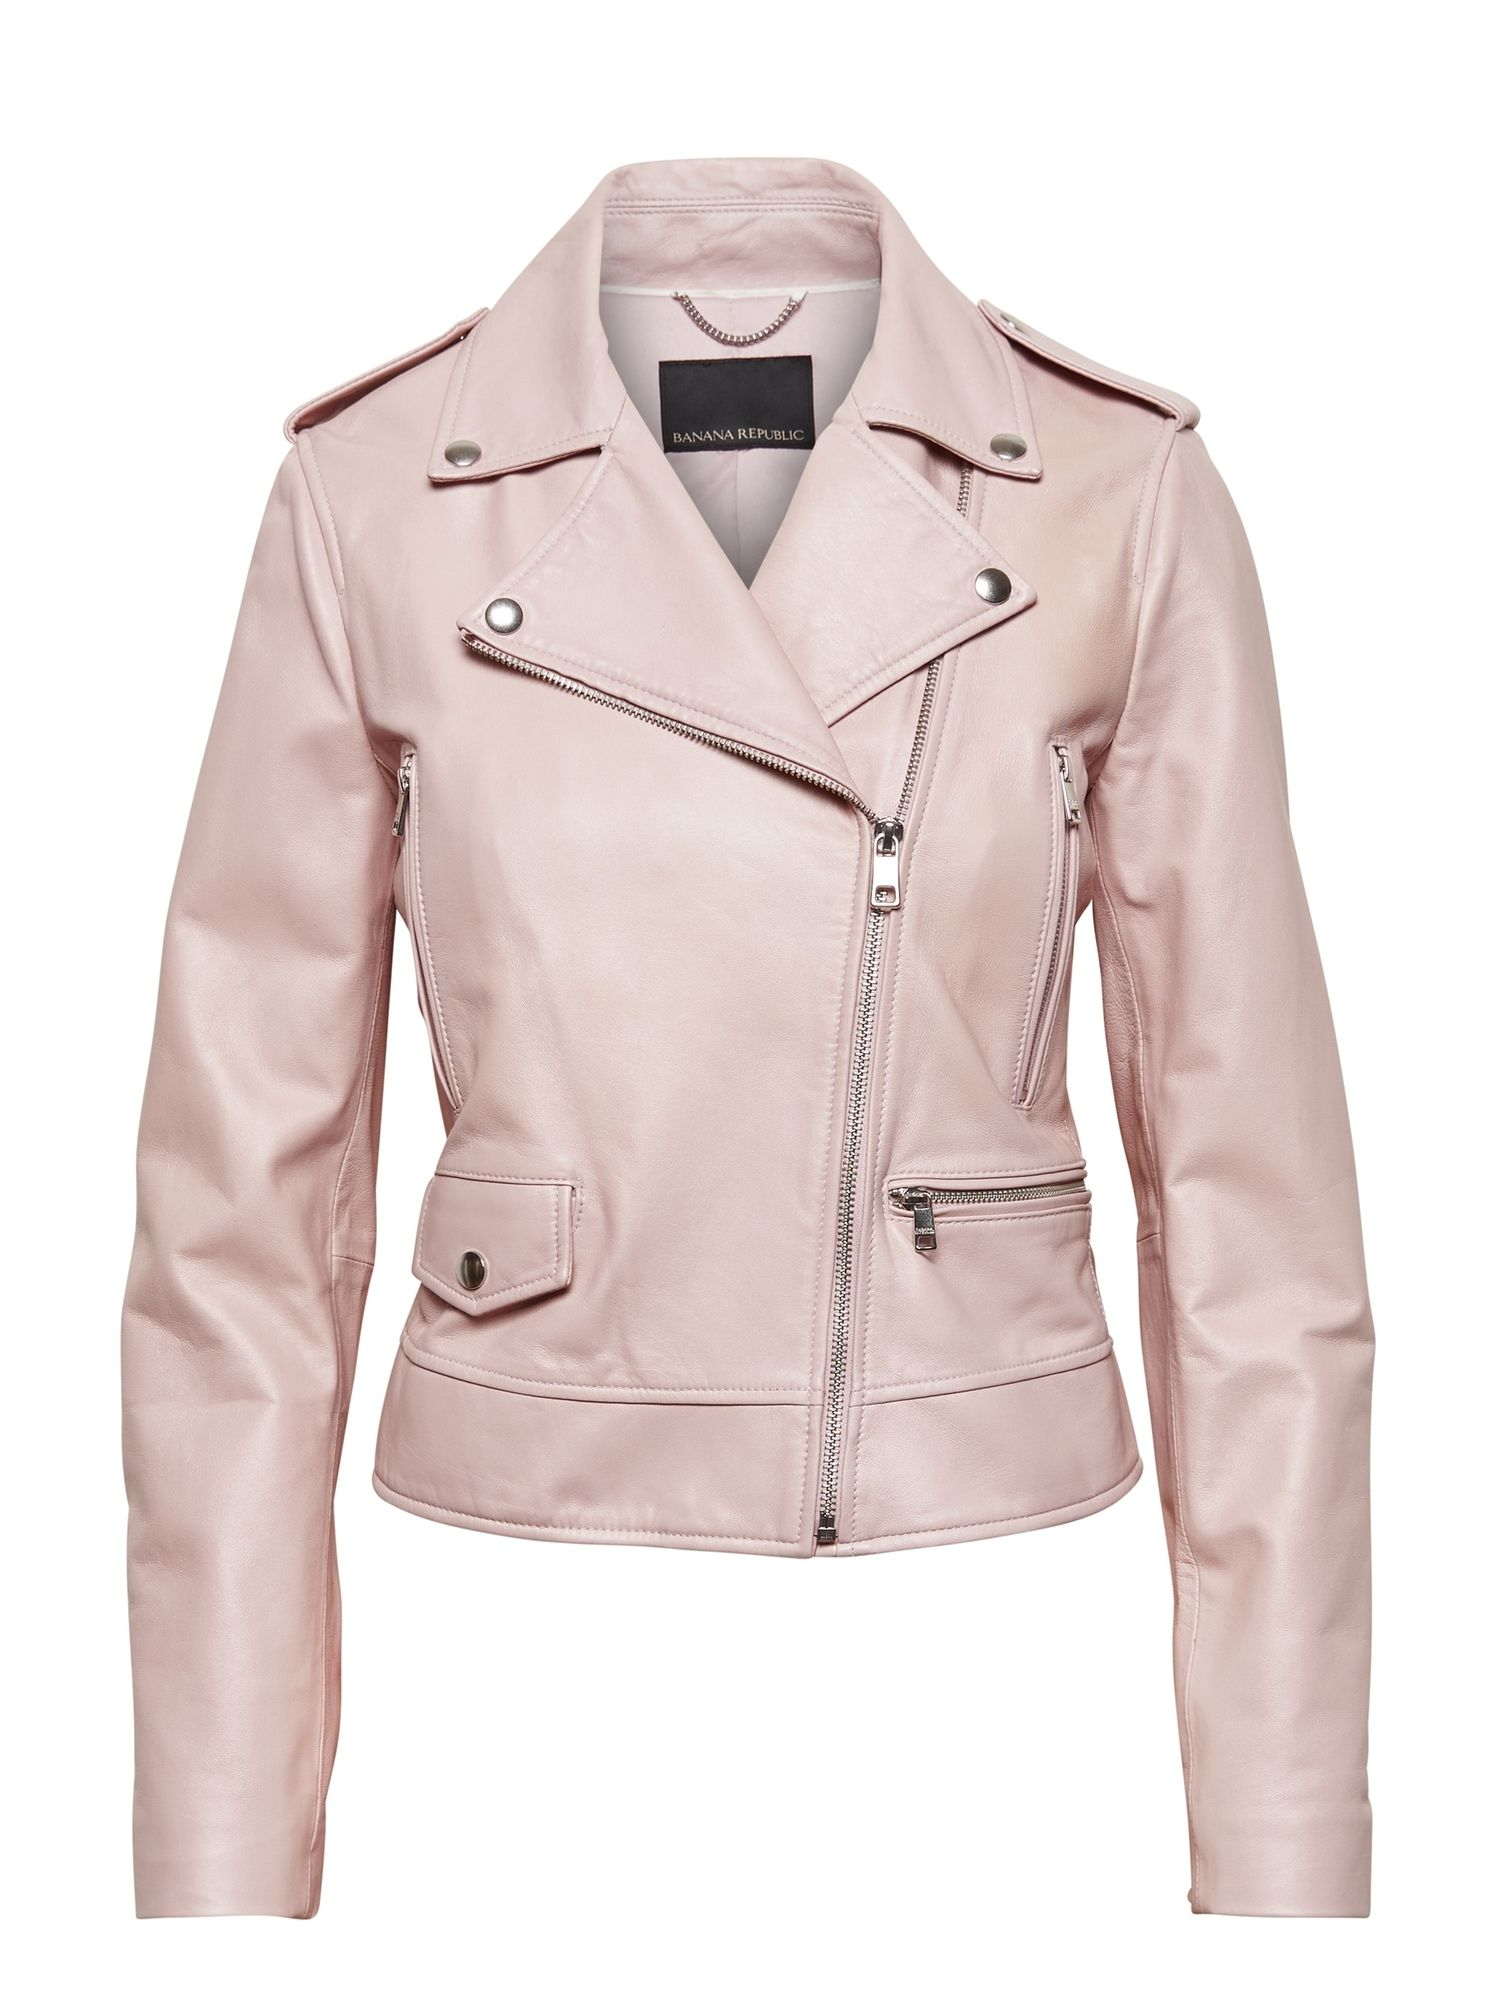 Leather Moto Jacket Banana Republic Beige Leather Jacket Moto Jacket Outfit Leather Jacket Outfits [ 2000 x 1500 Pixel ]